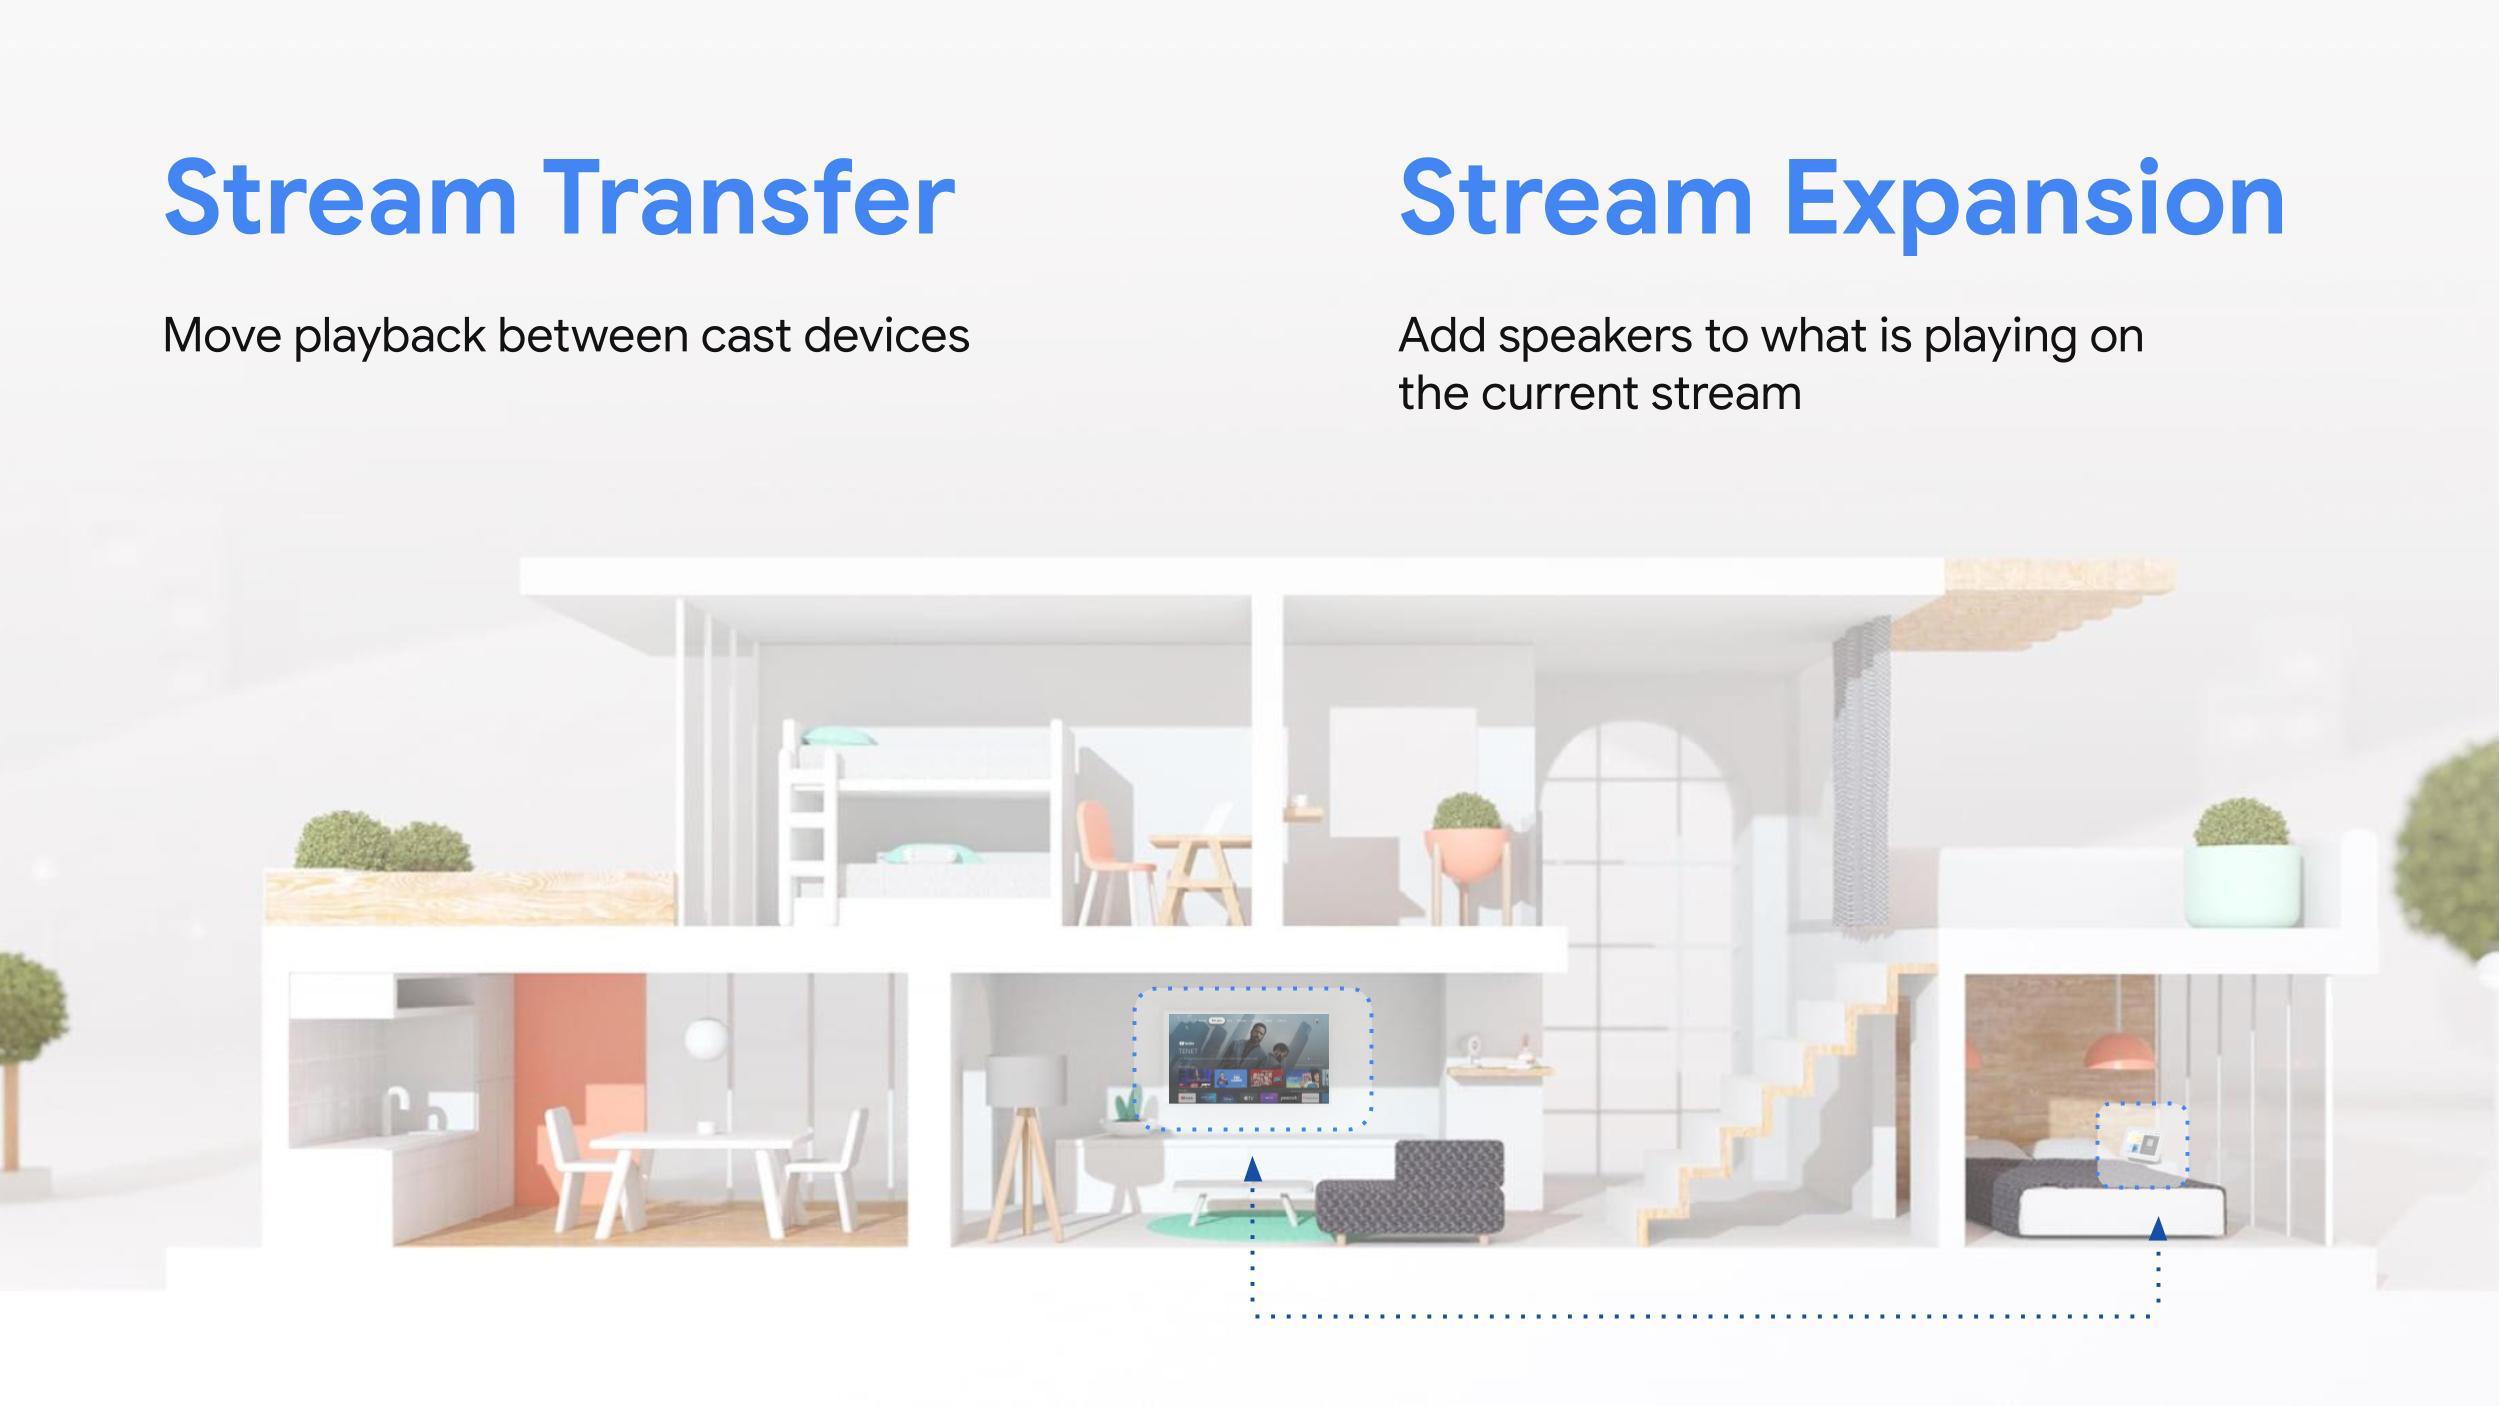 Google Android TV流傳輸和流擴展。  Google圖形解釋了新的Stream Transfer和Stream Expansion工具。 屬於Google I / O 2021的一部分。